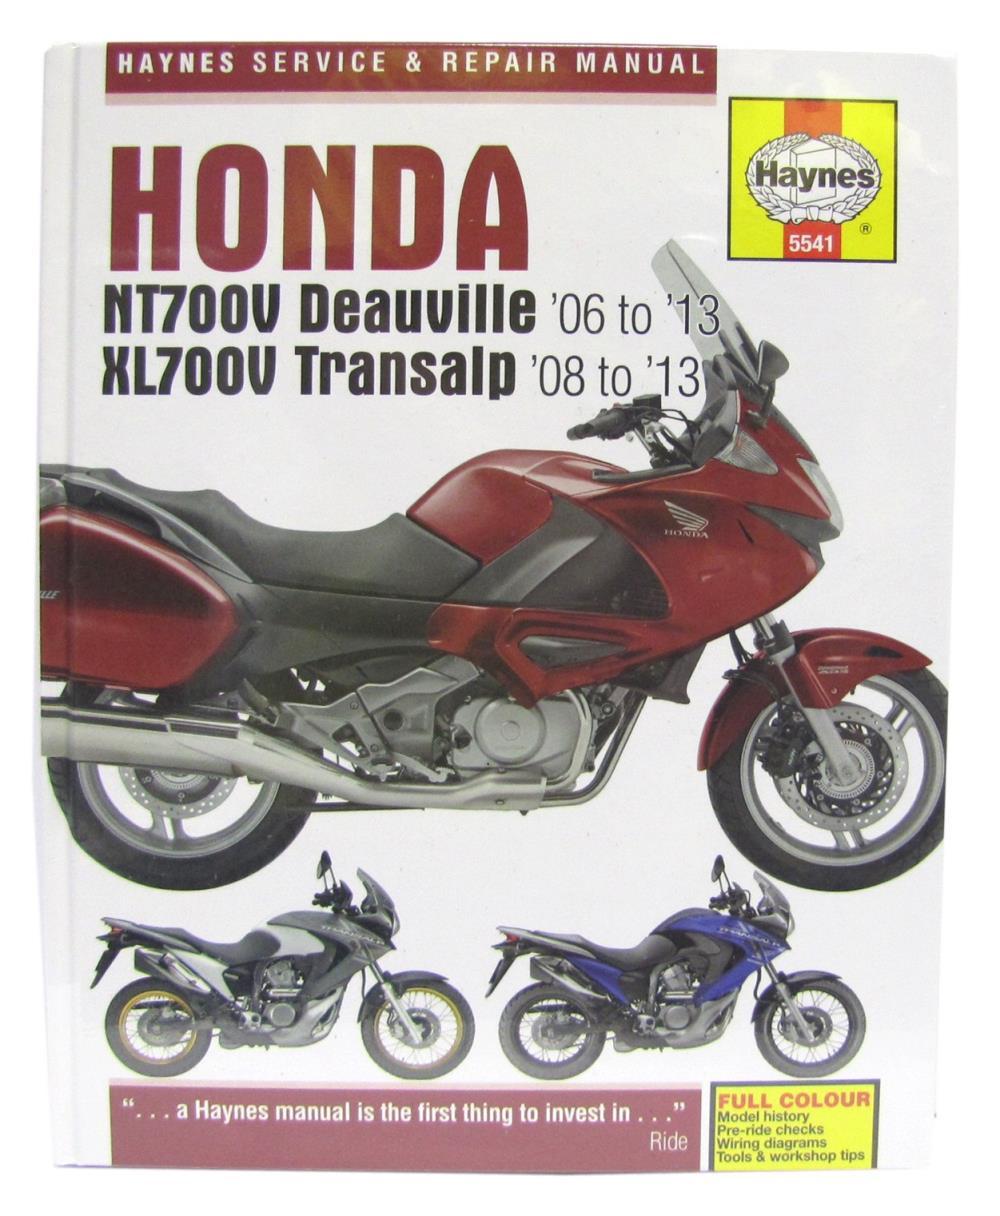 honda xl 700 v transalp 2010 haynes service repair manual 5541 ebay rh ebay com Honda NX650 Dominator Honda NX650 Dominator